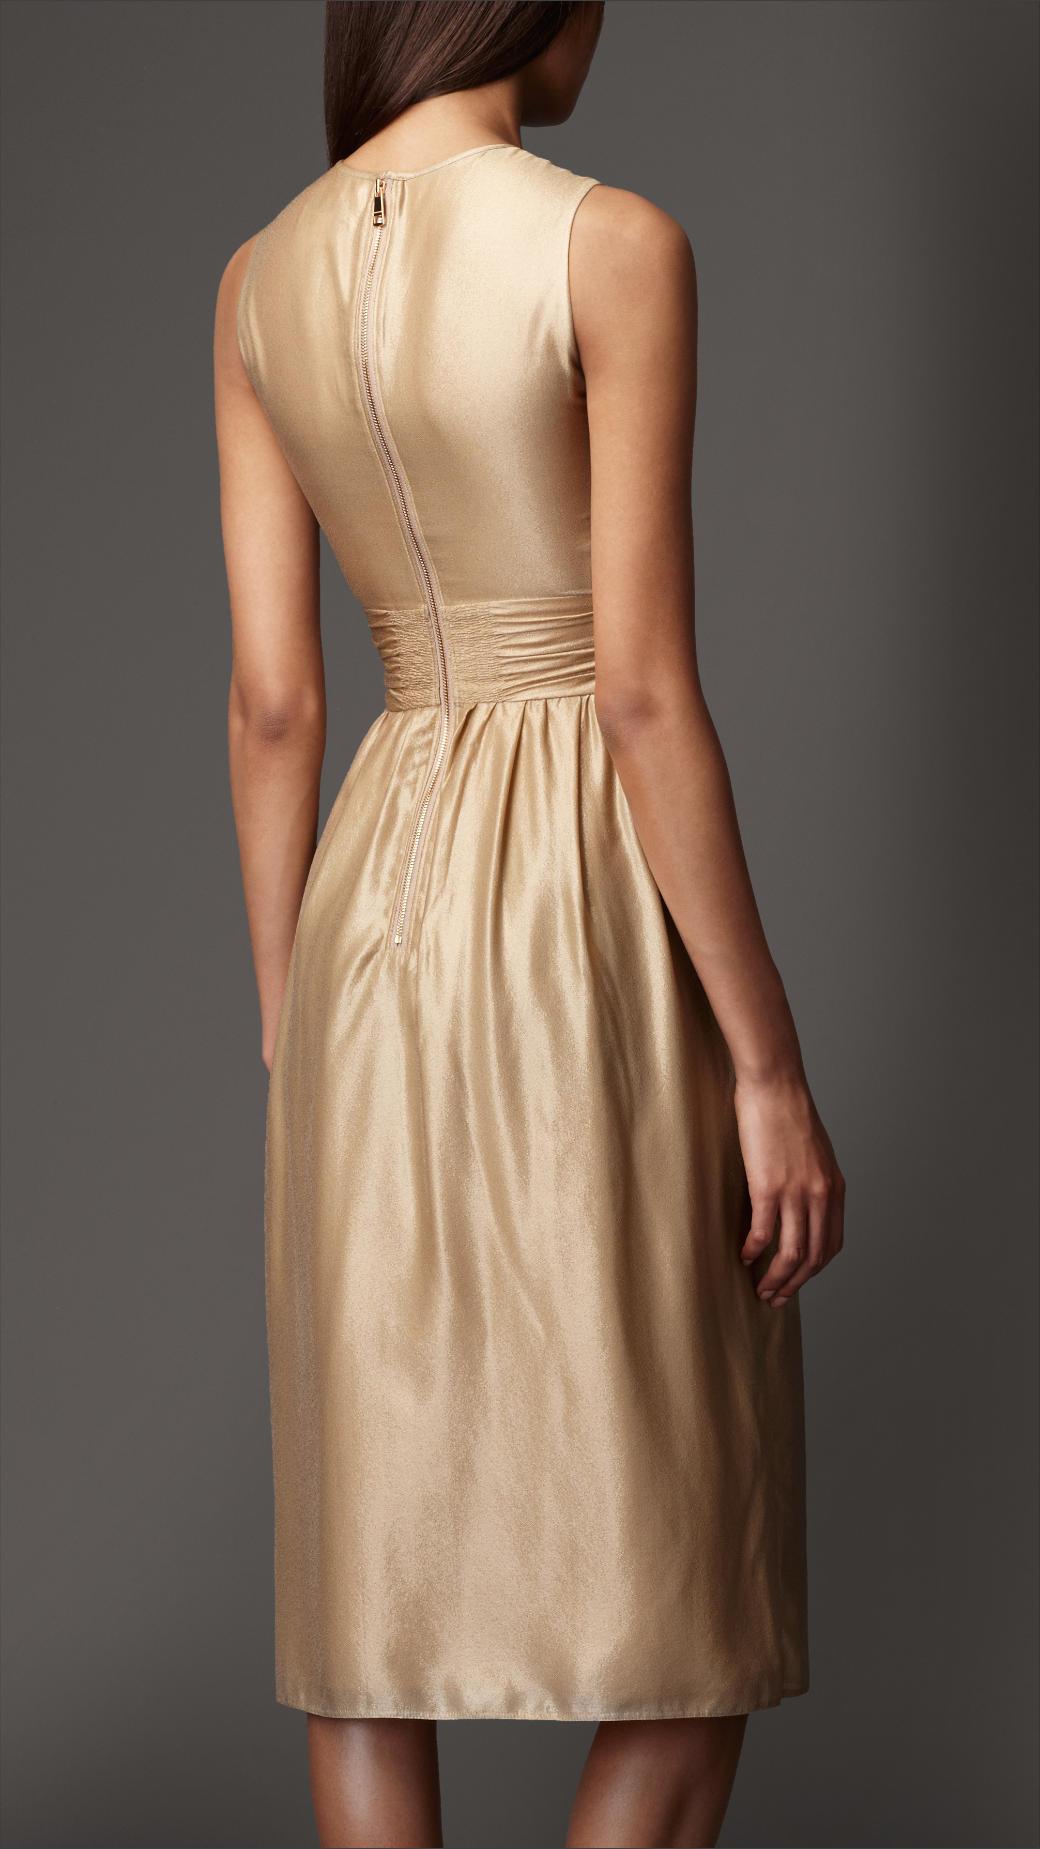 a10ef563ed5df Burberry Keyhole Gold Dress in Metallic - Lyst